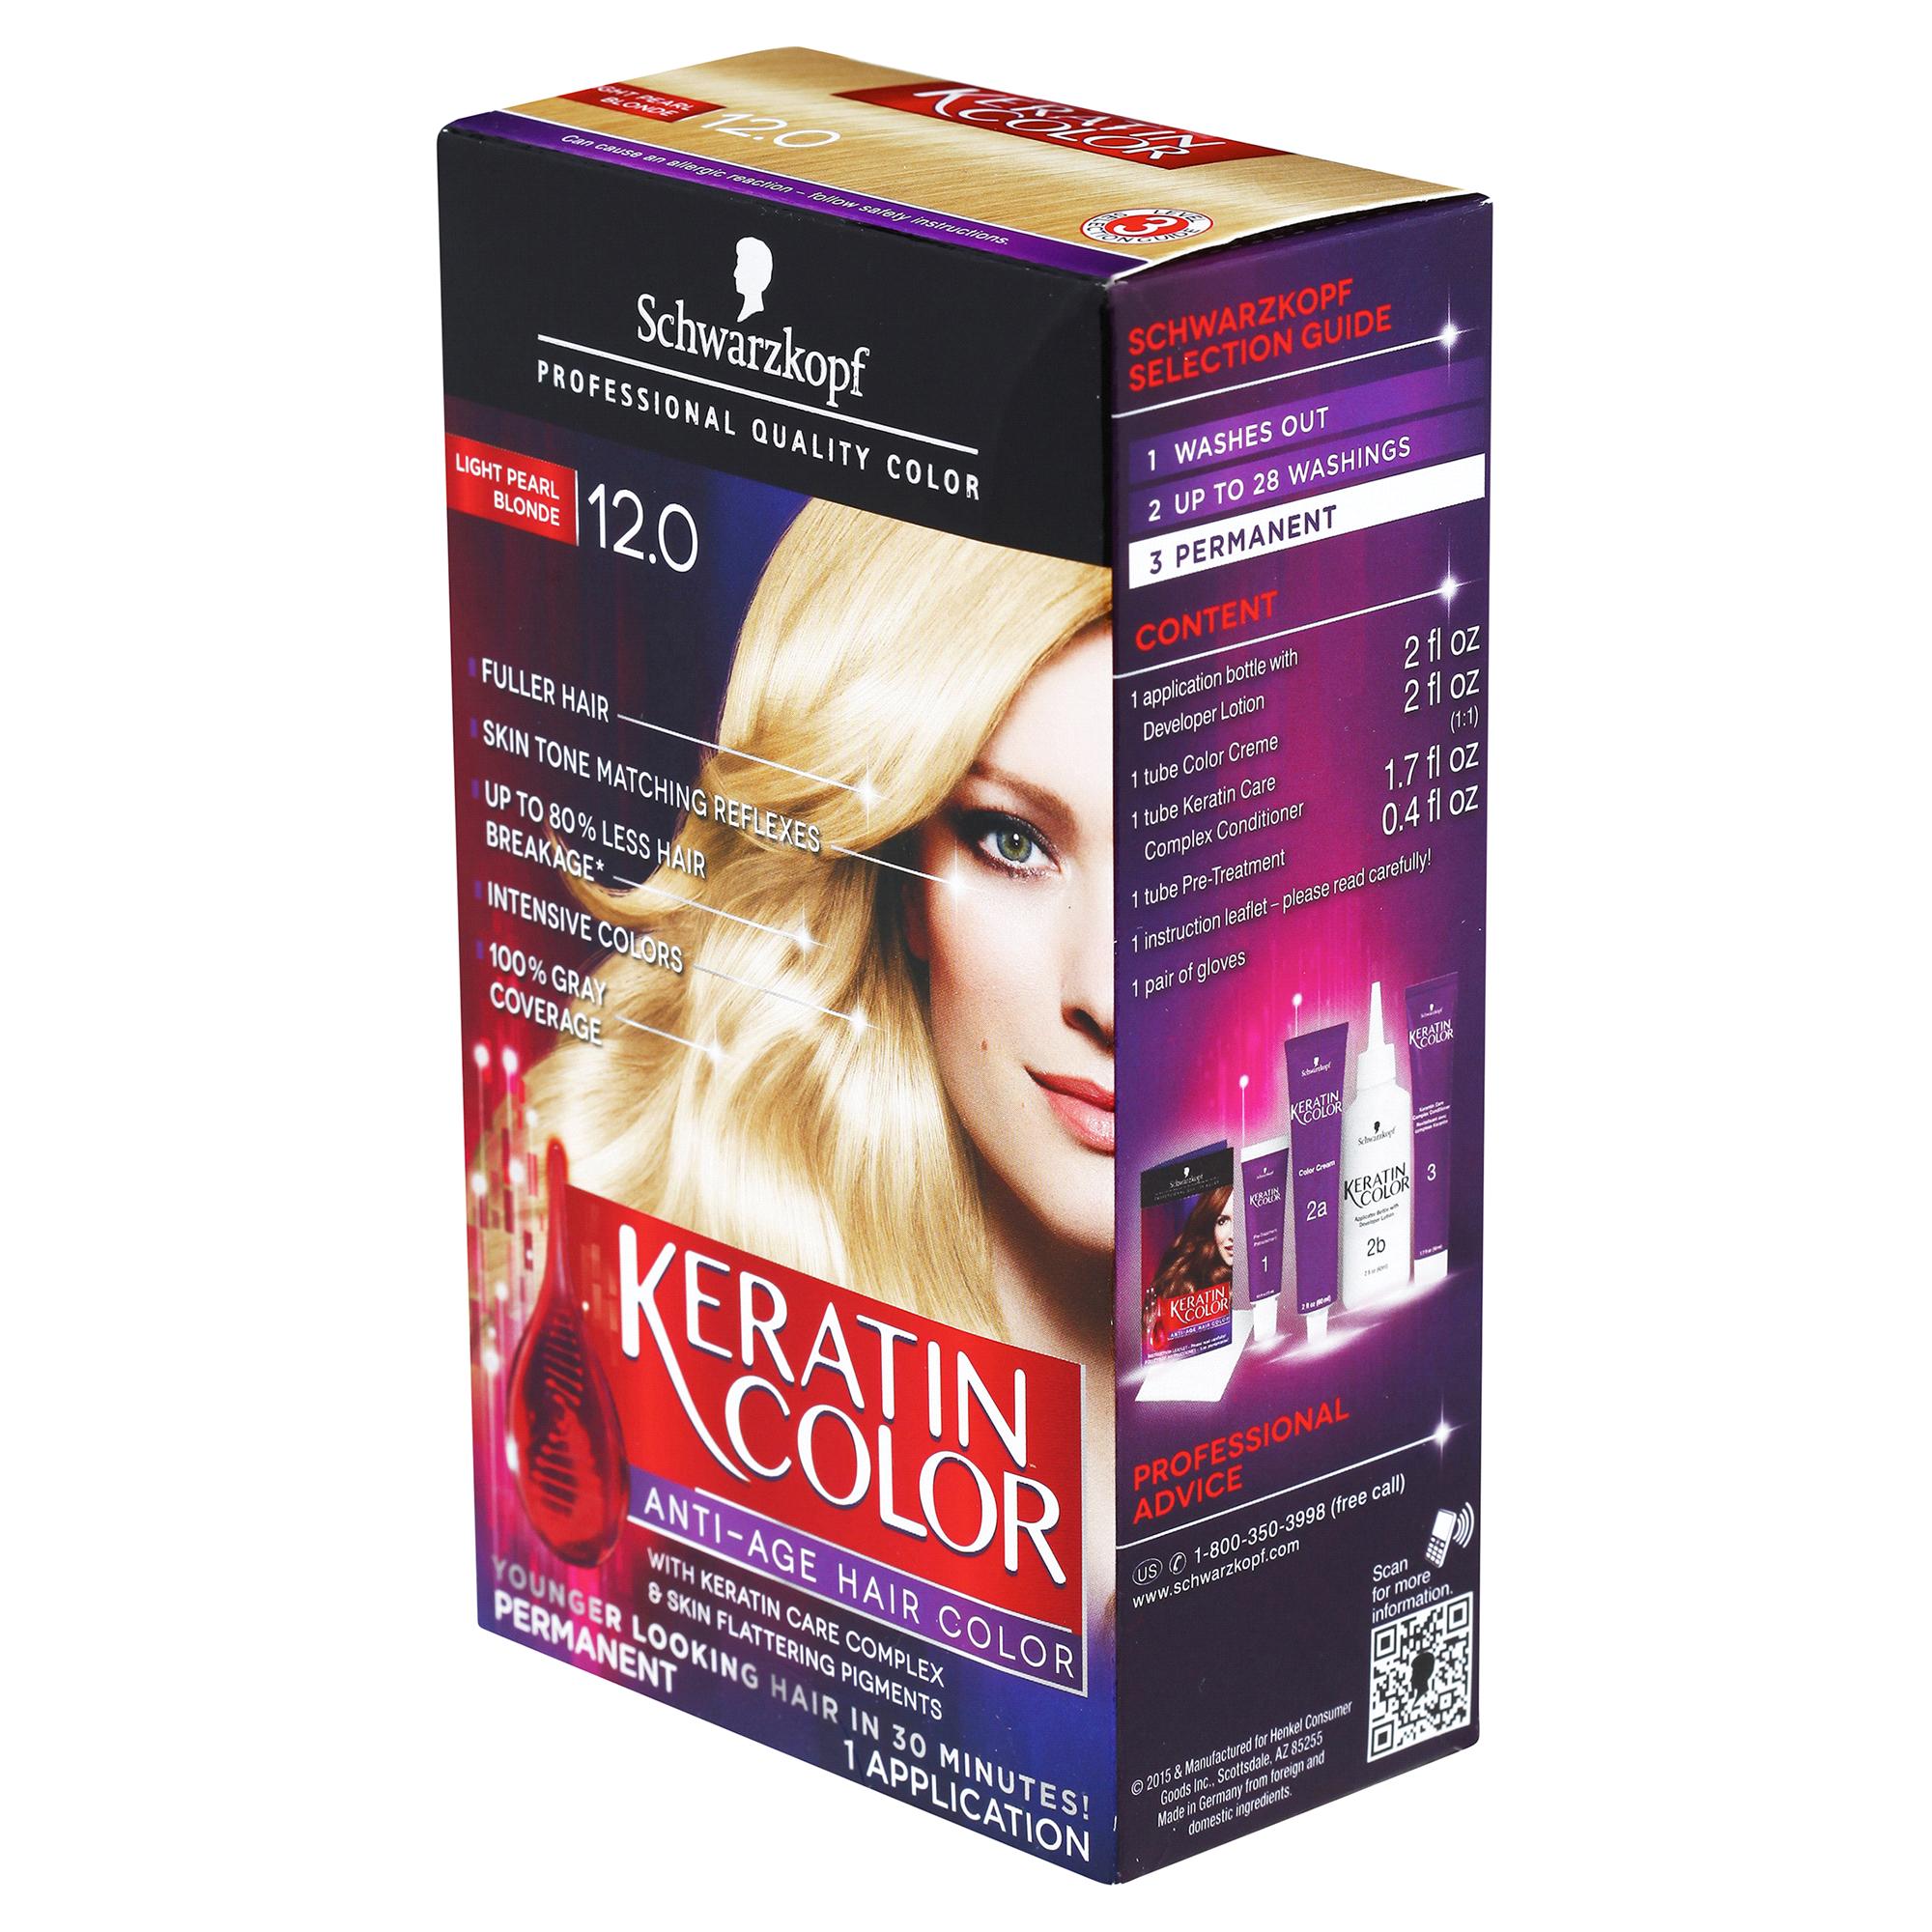 Schwarzkopf Keratin Color Anti Age Hair Color 120 Light Pearl